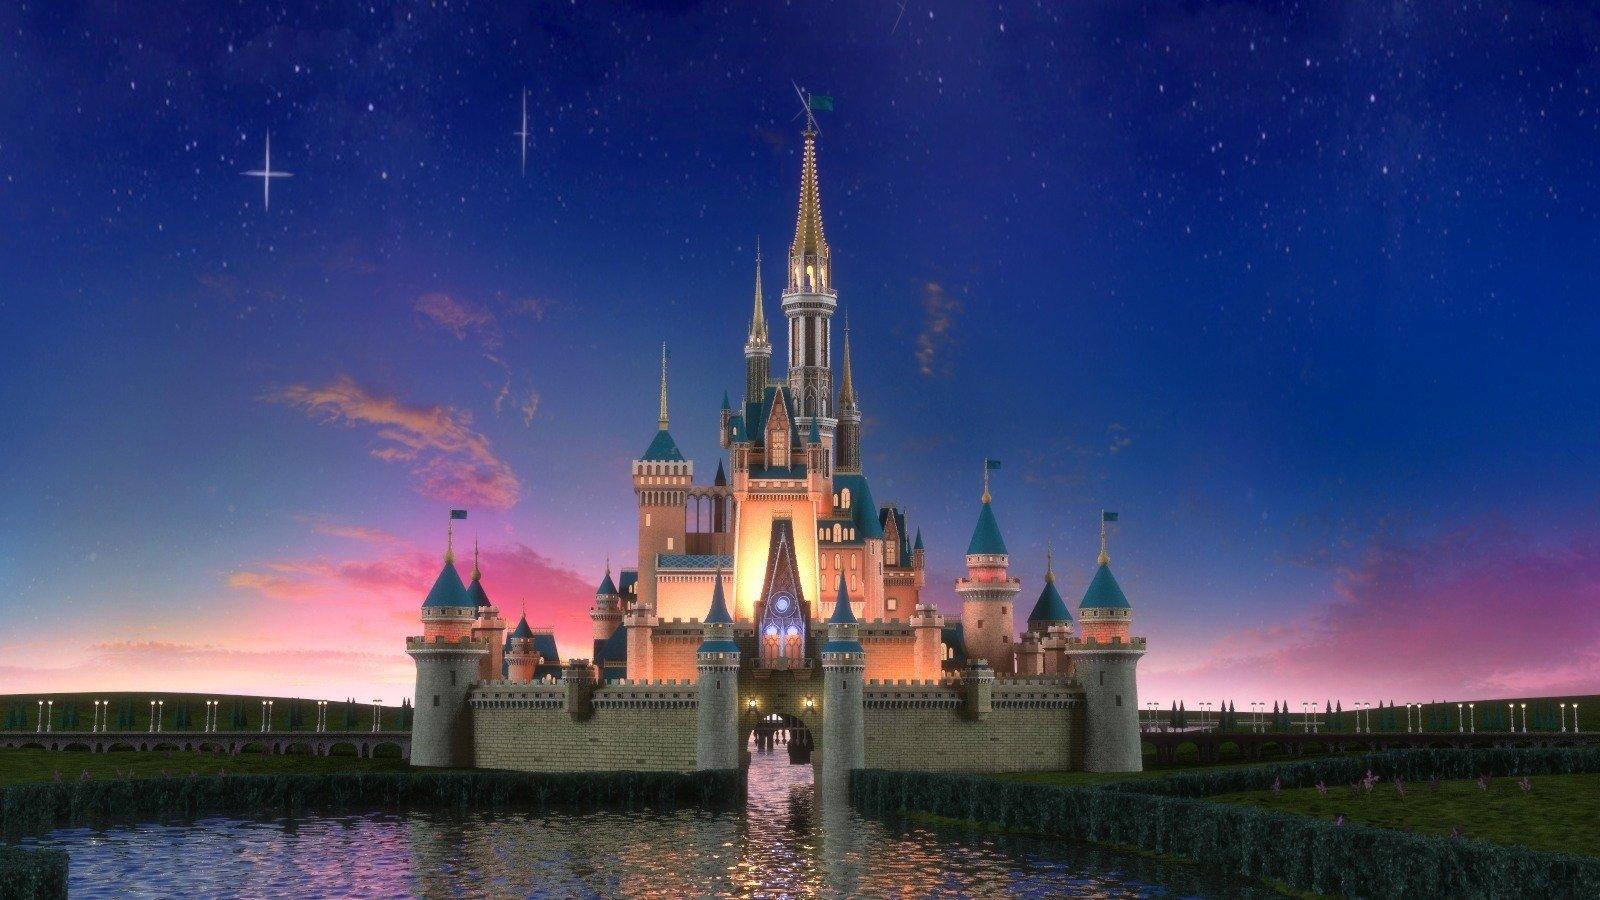 Disney castelo mágico